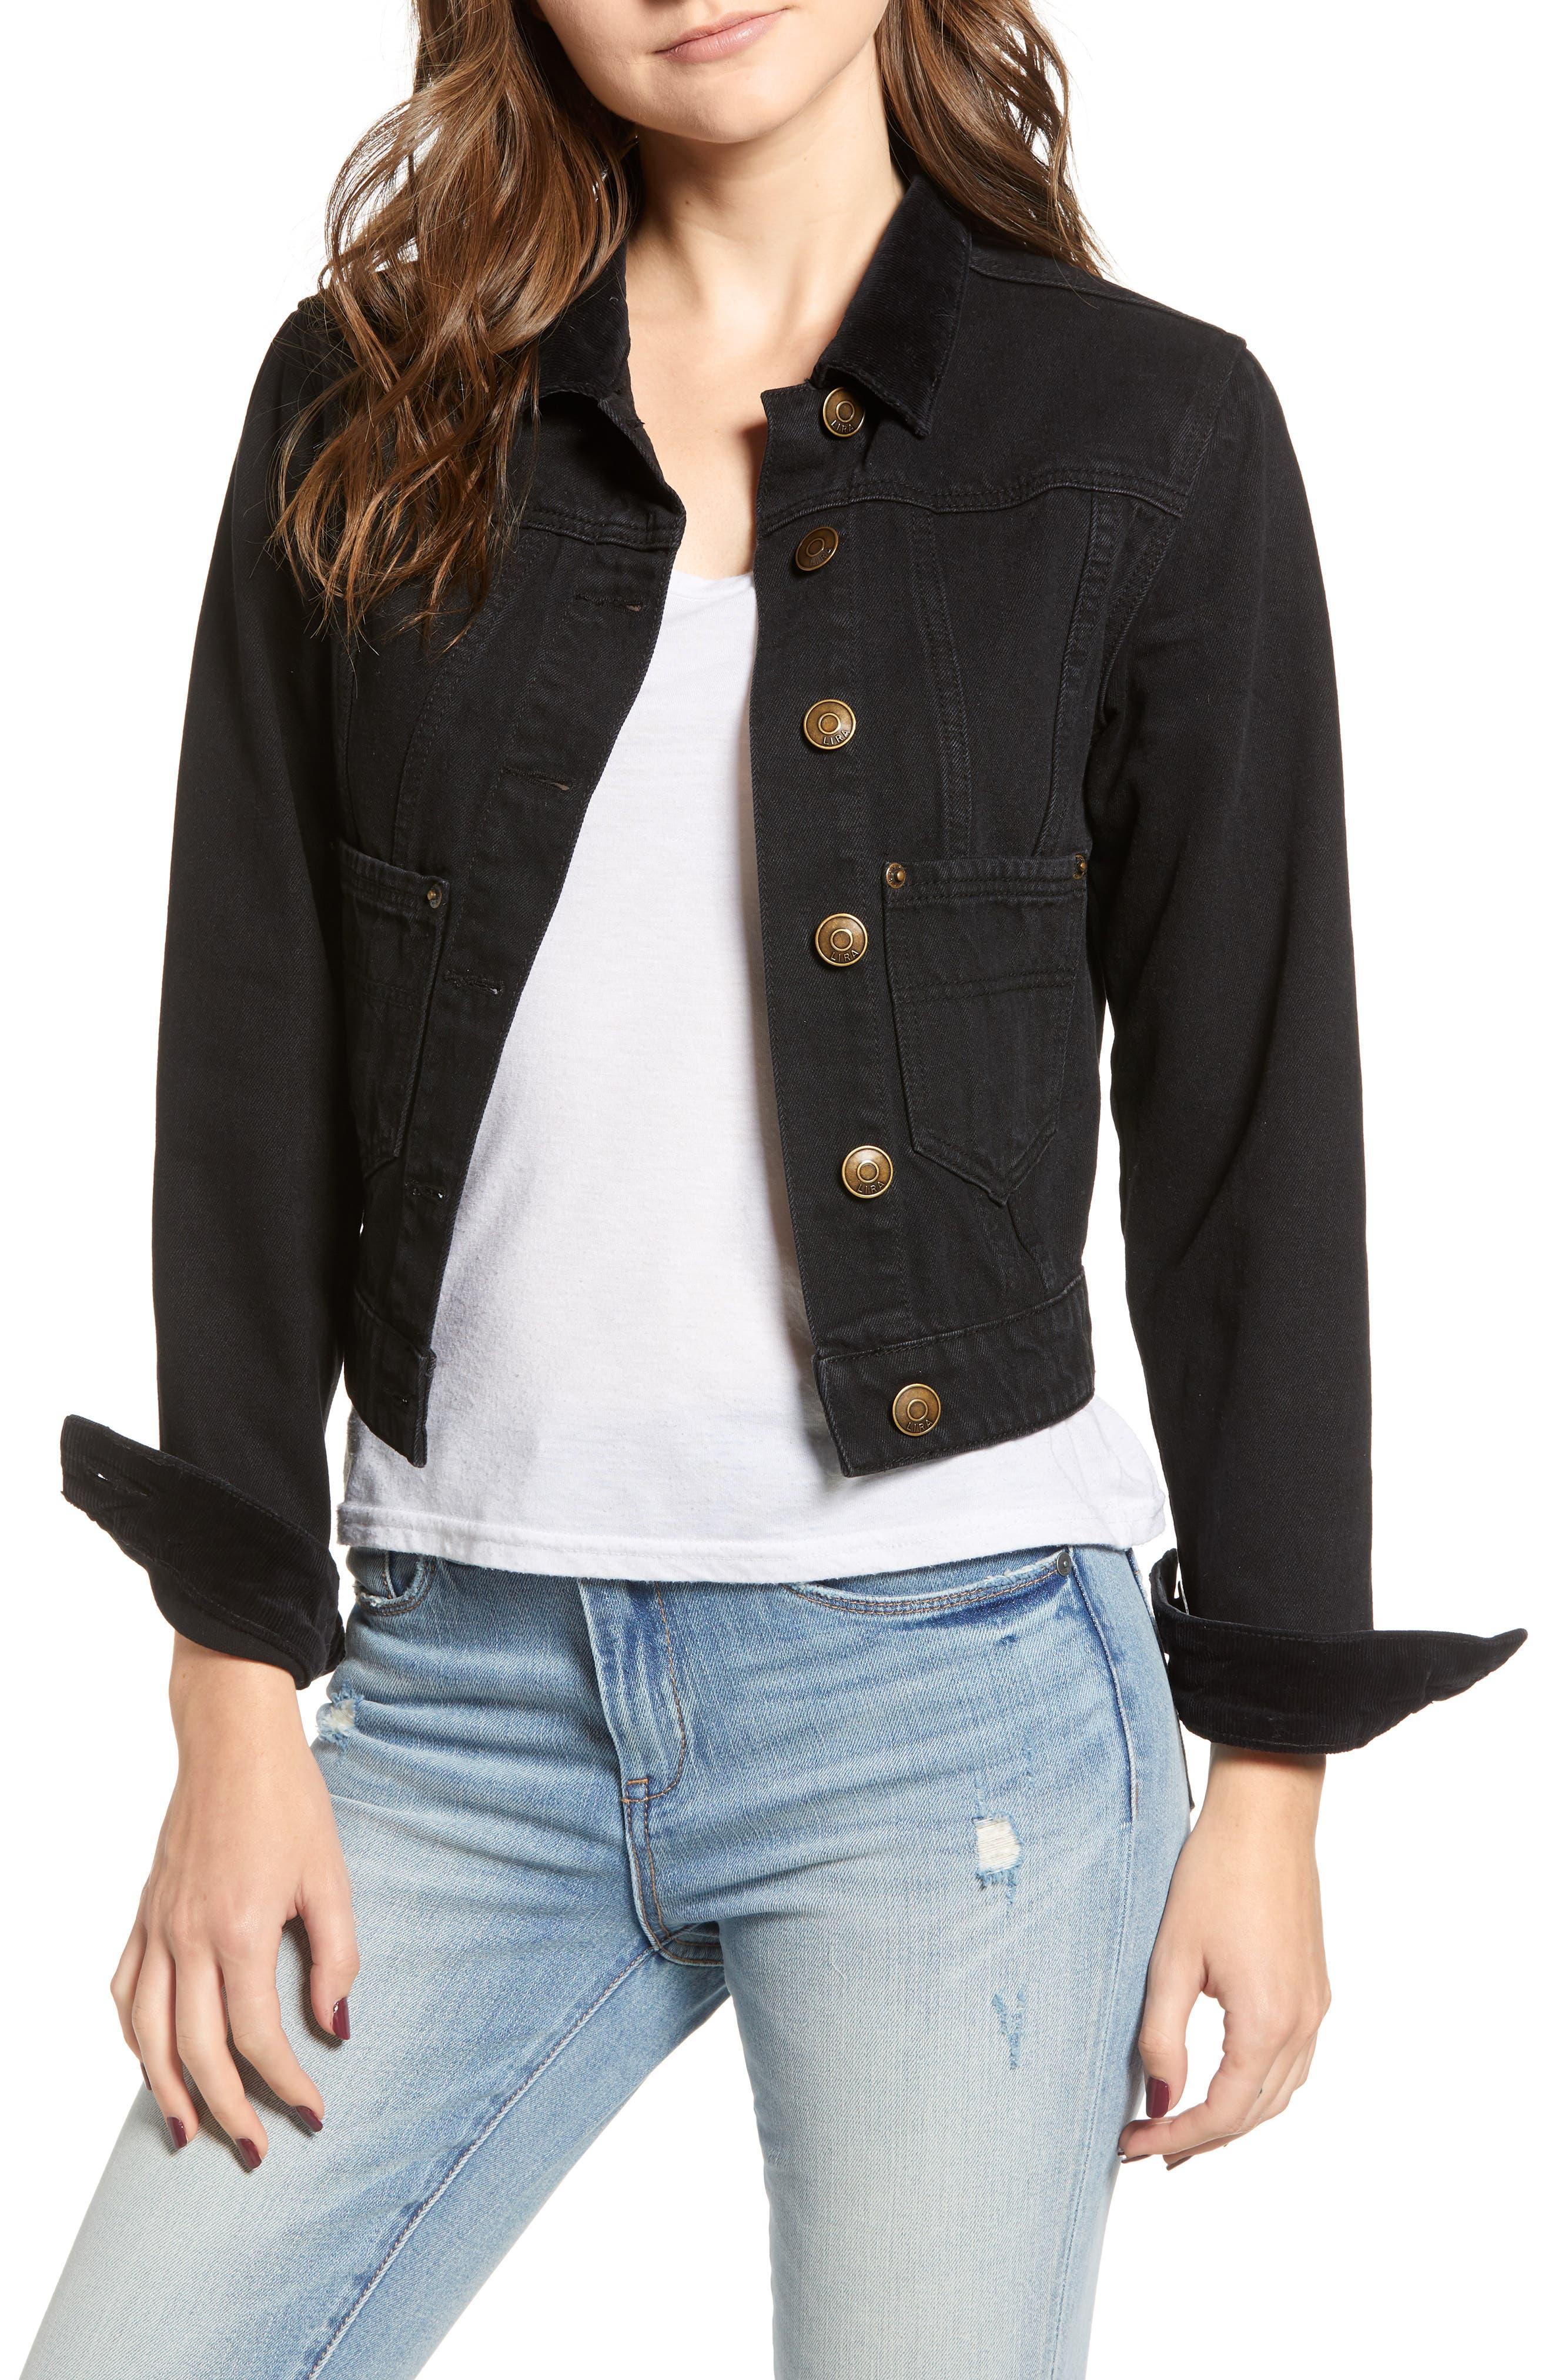 Polara Denim Jacket,                             Main thumbnail 1, color,                             WASHED BLACK